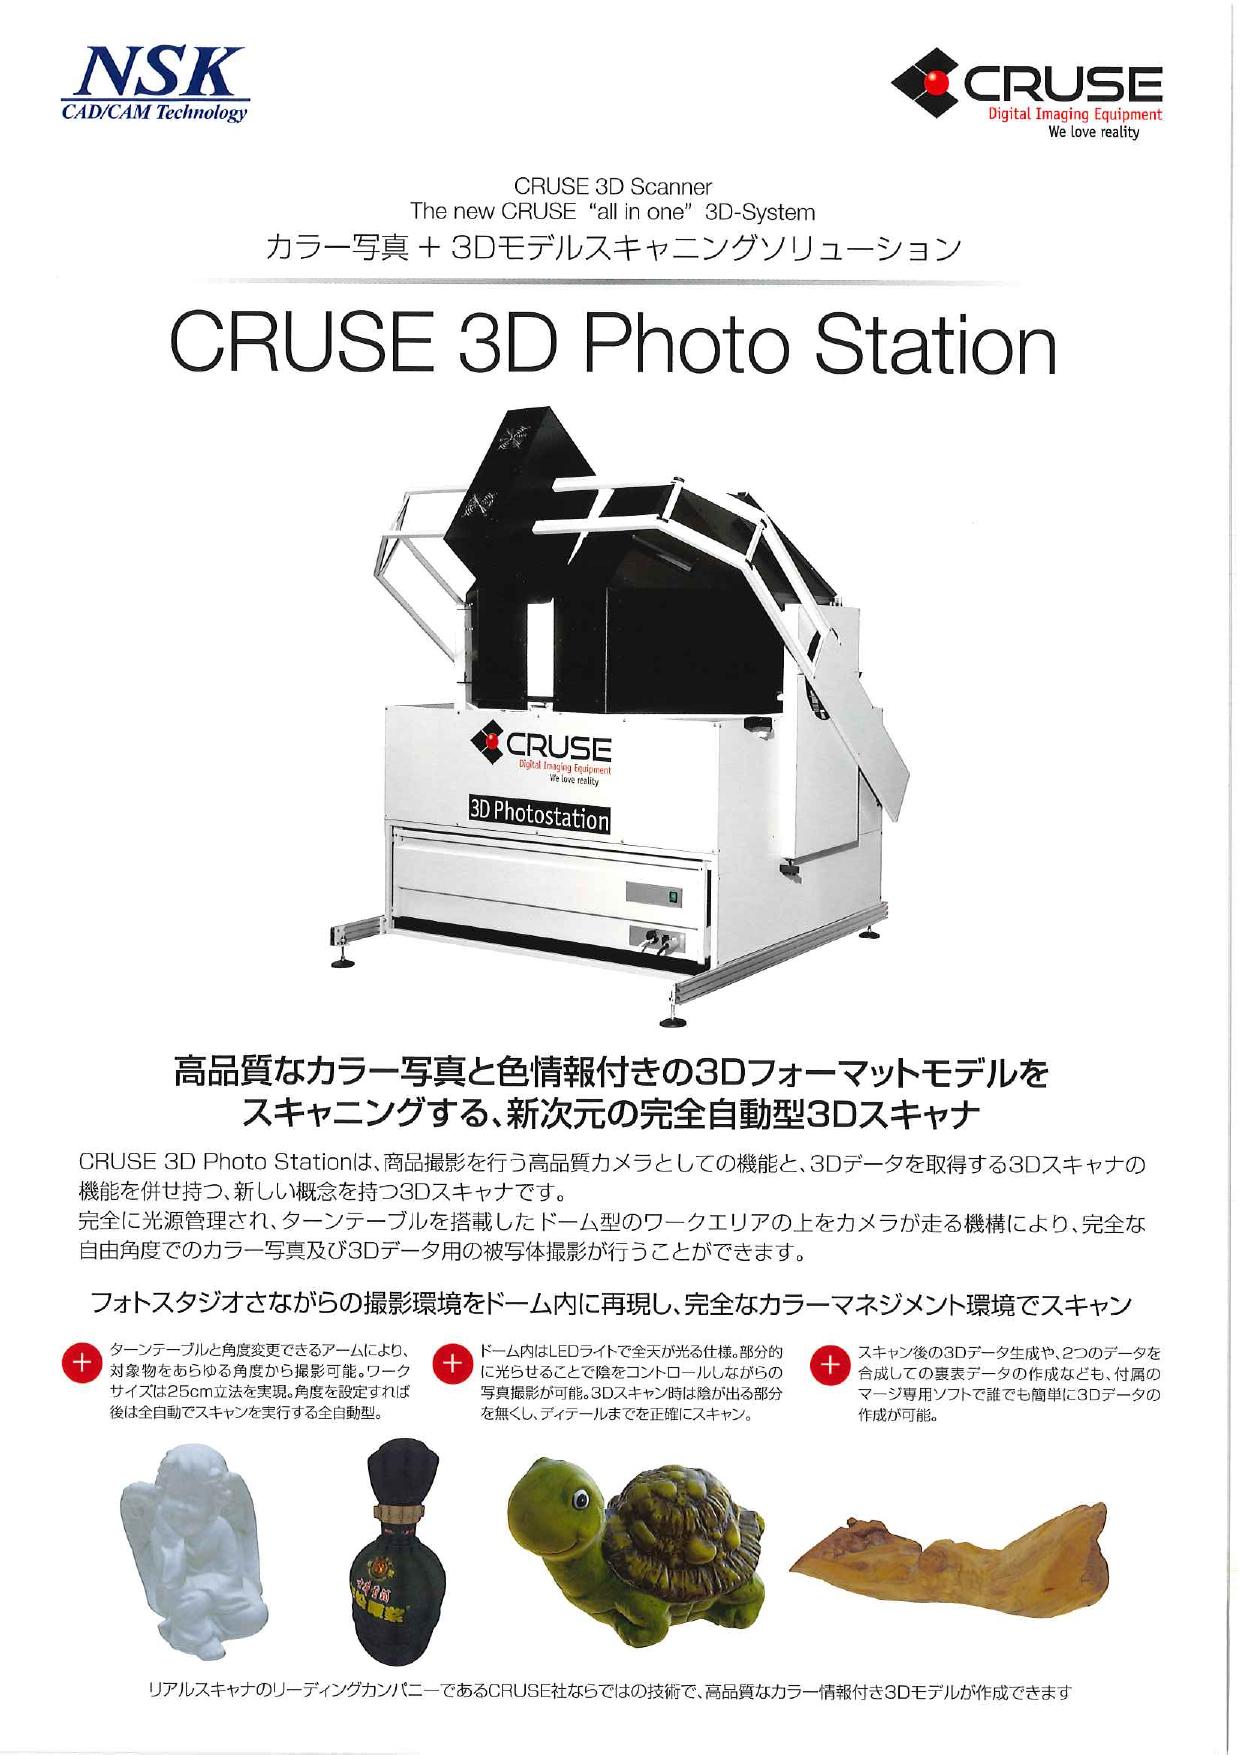 3Dスキャナ CRUSE 3D Photo Station